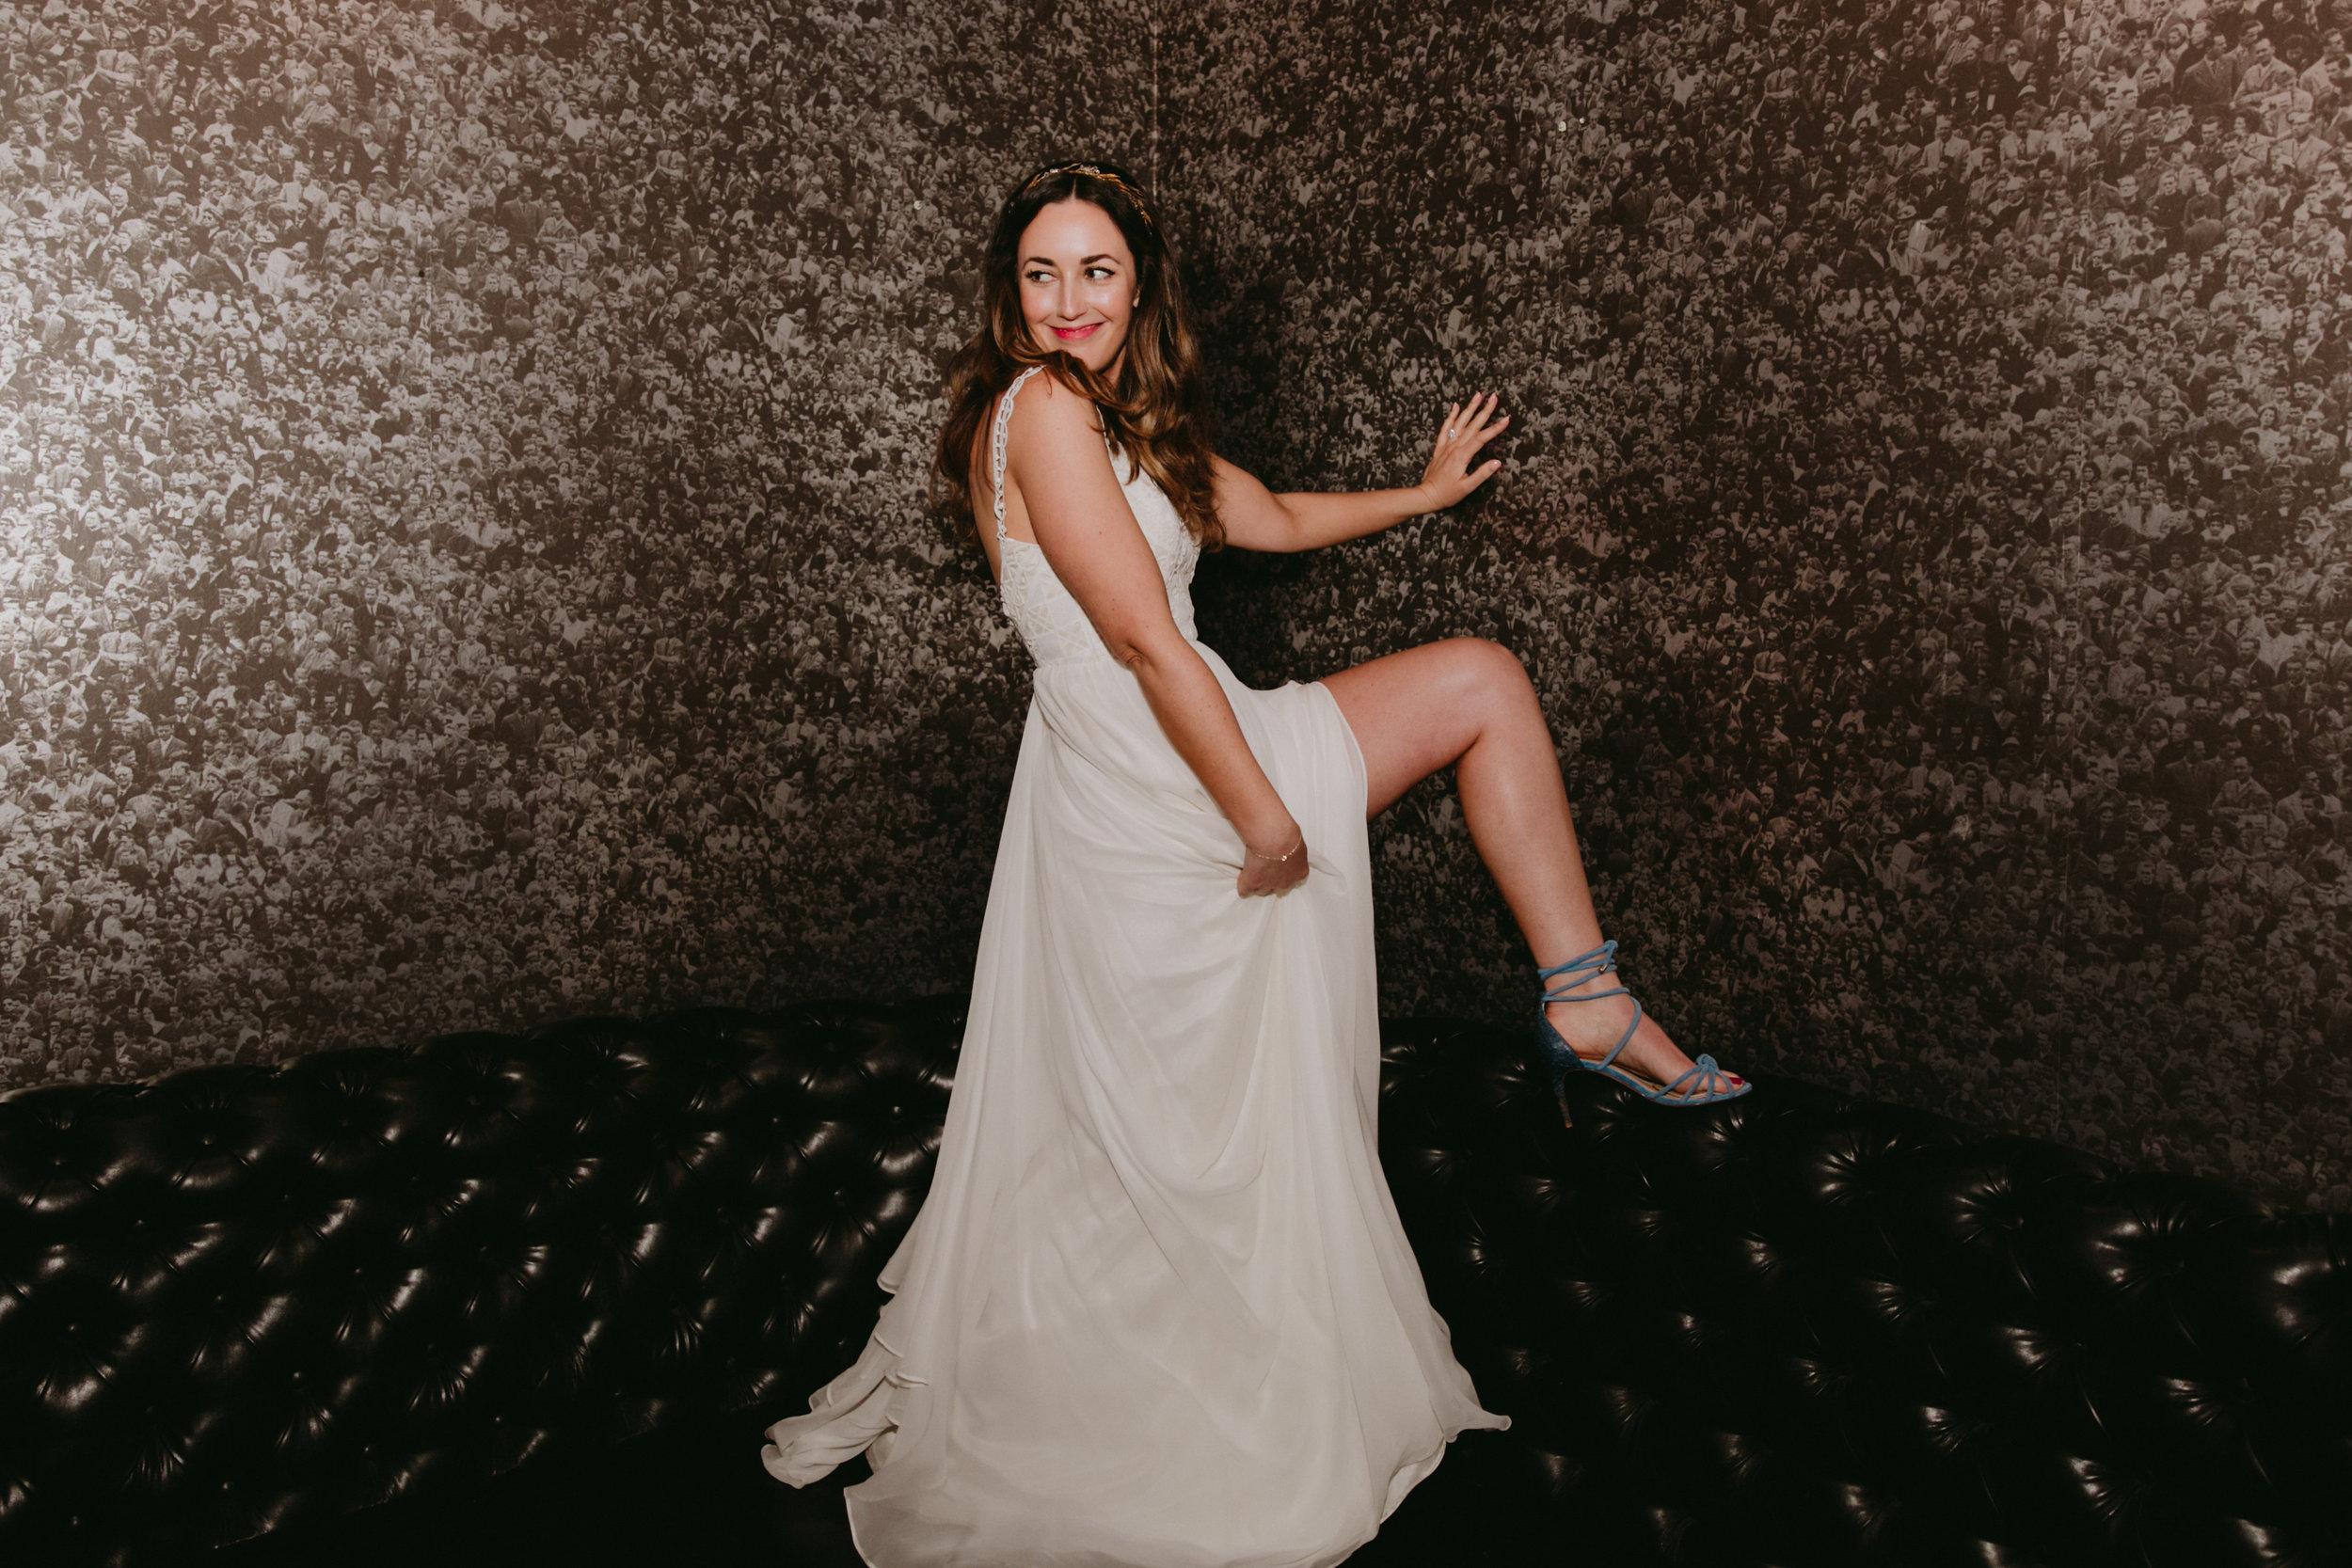 501Union_Brooklyn_Wedding_Photographer_Chellise_Michael_Photography-400.jpg